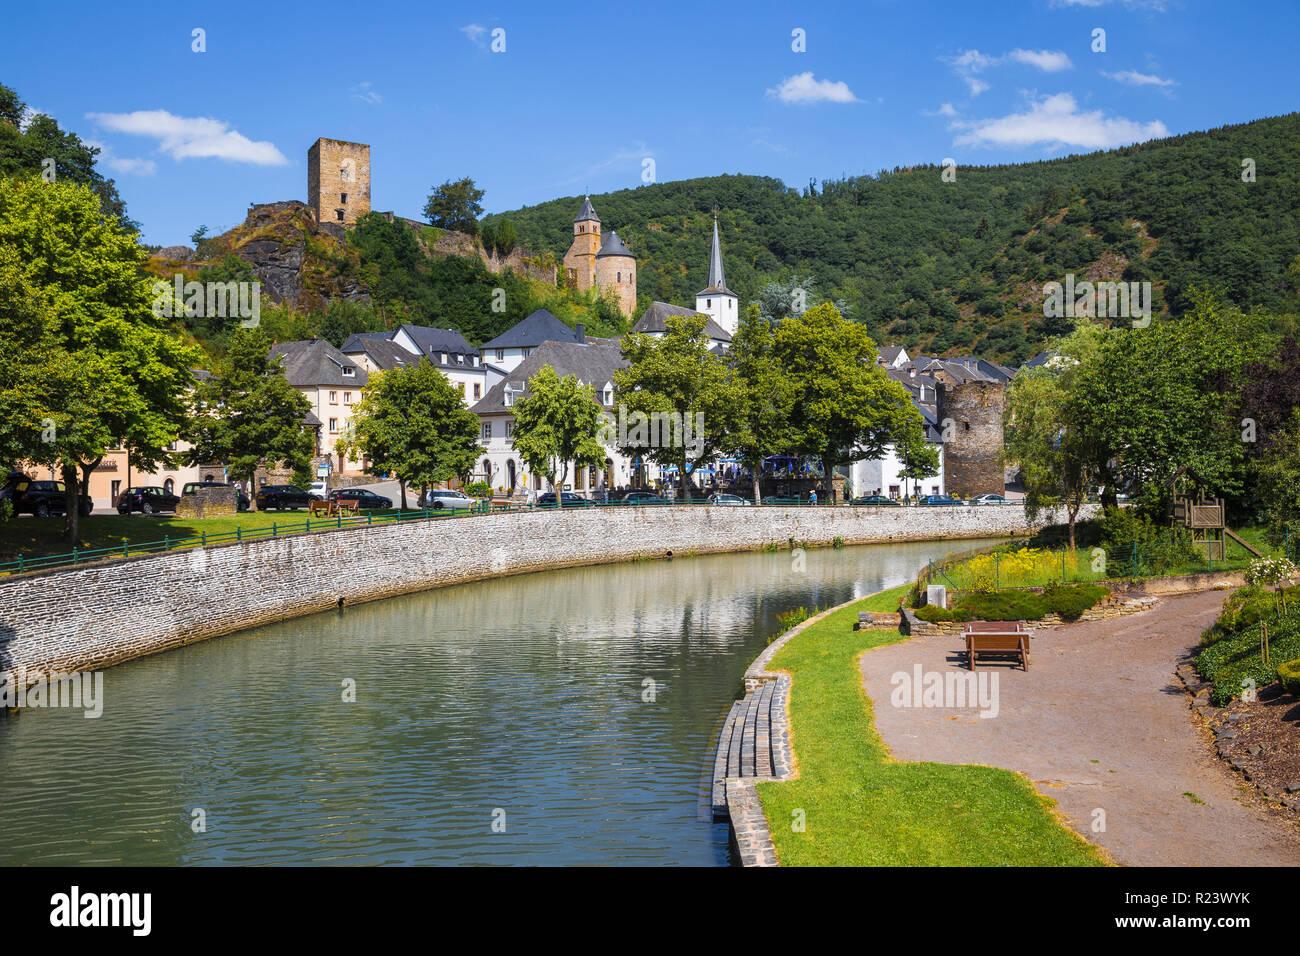 Esch-sur-Sûre, Luxembourg, Europe Photo Stock